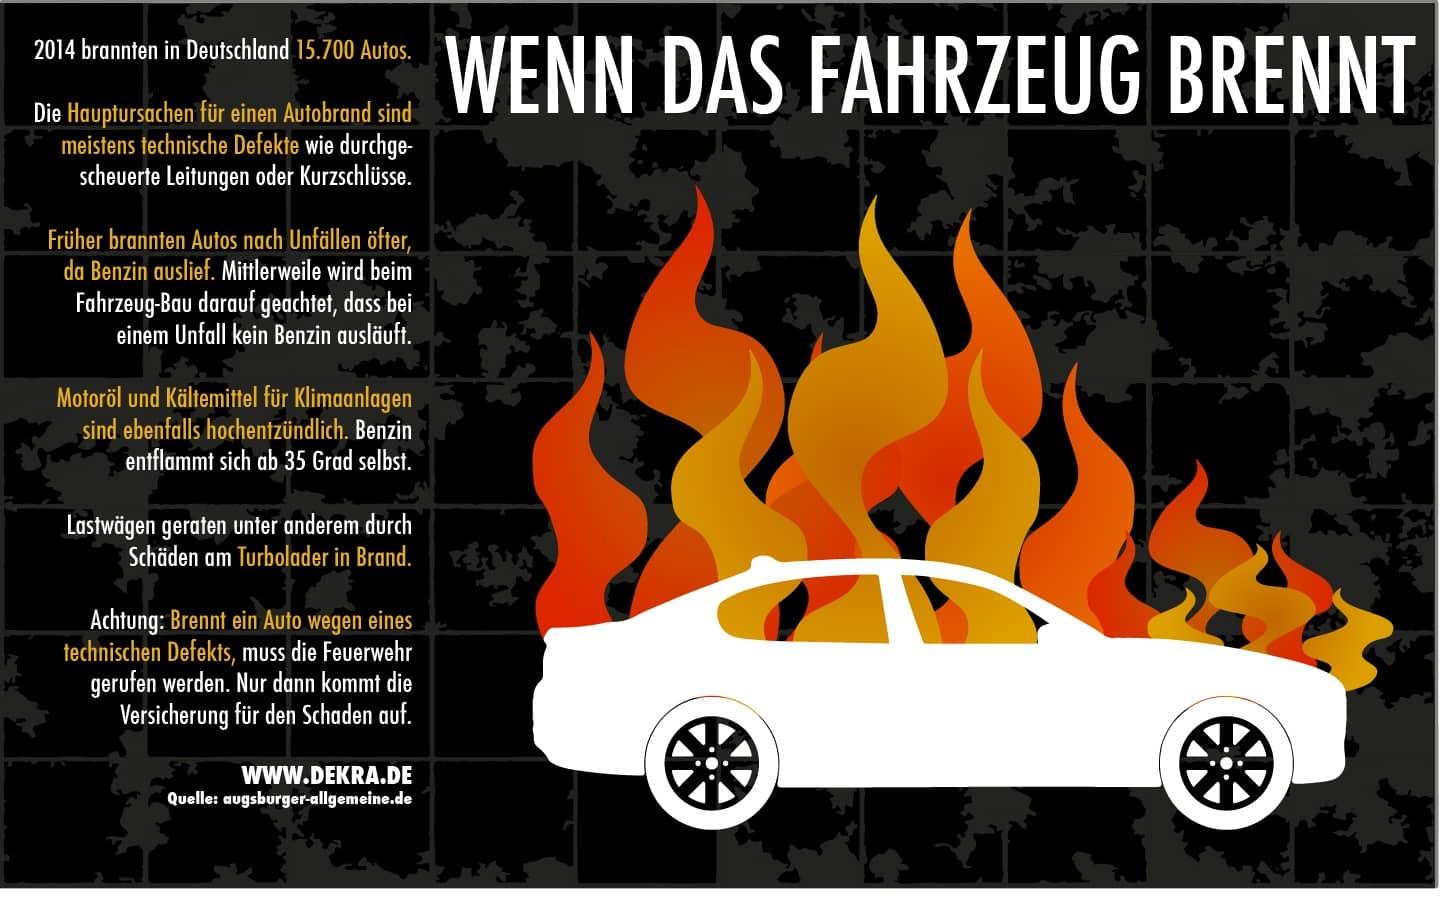 160615_DekraGrafik_FahrzeugBrennt_DE